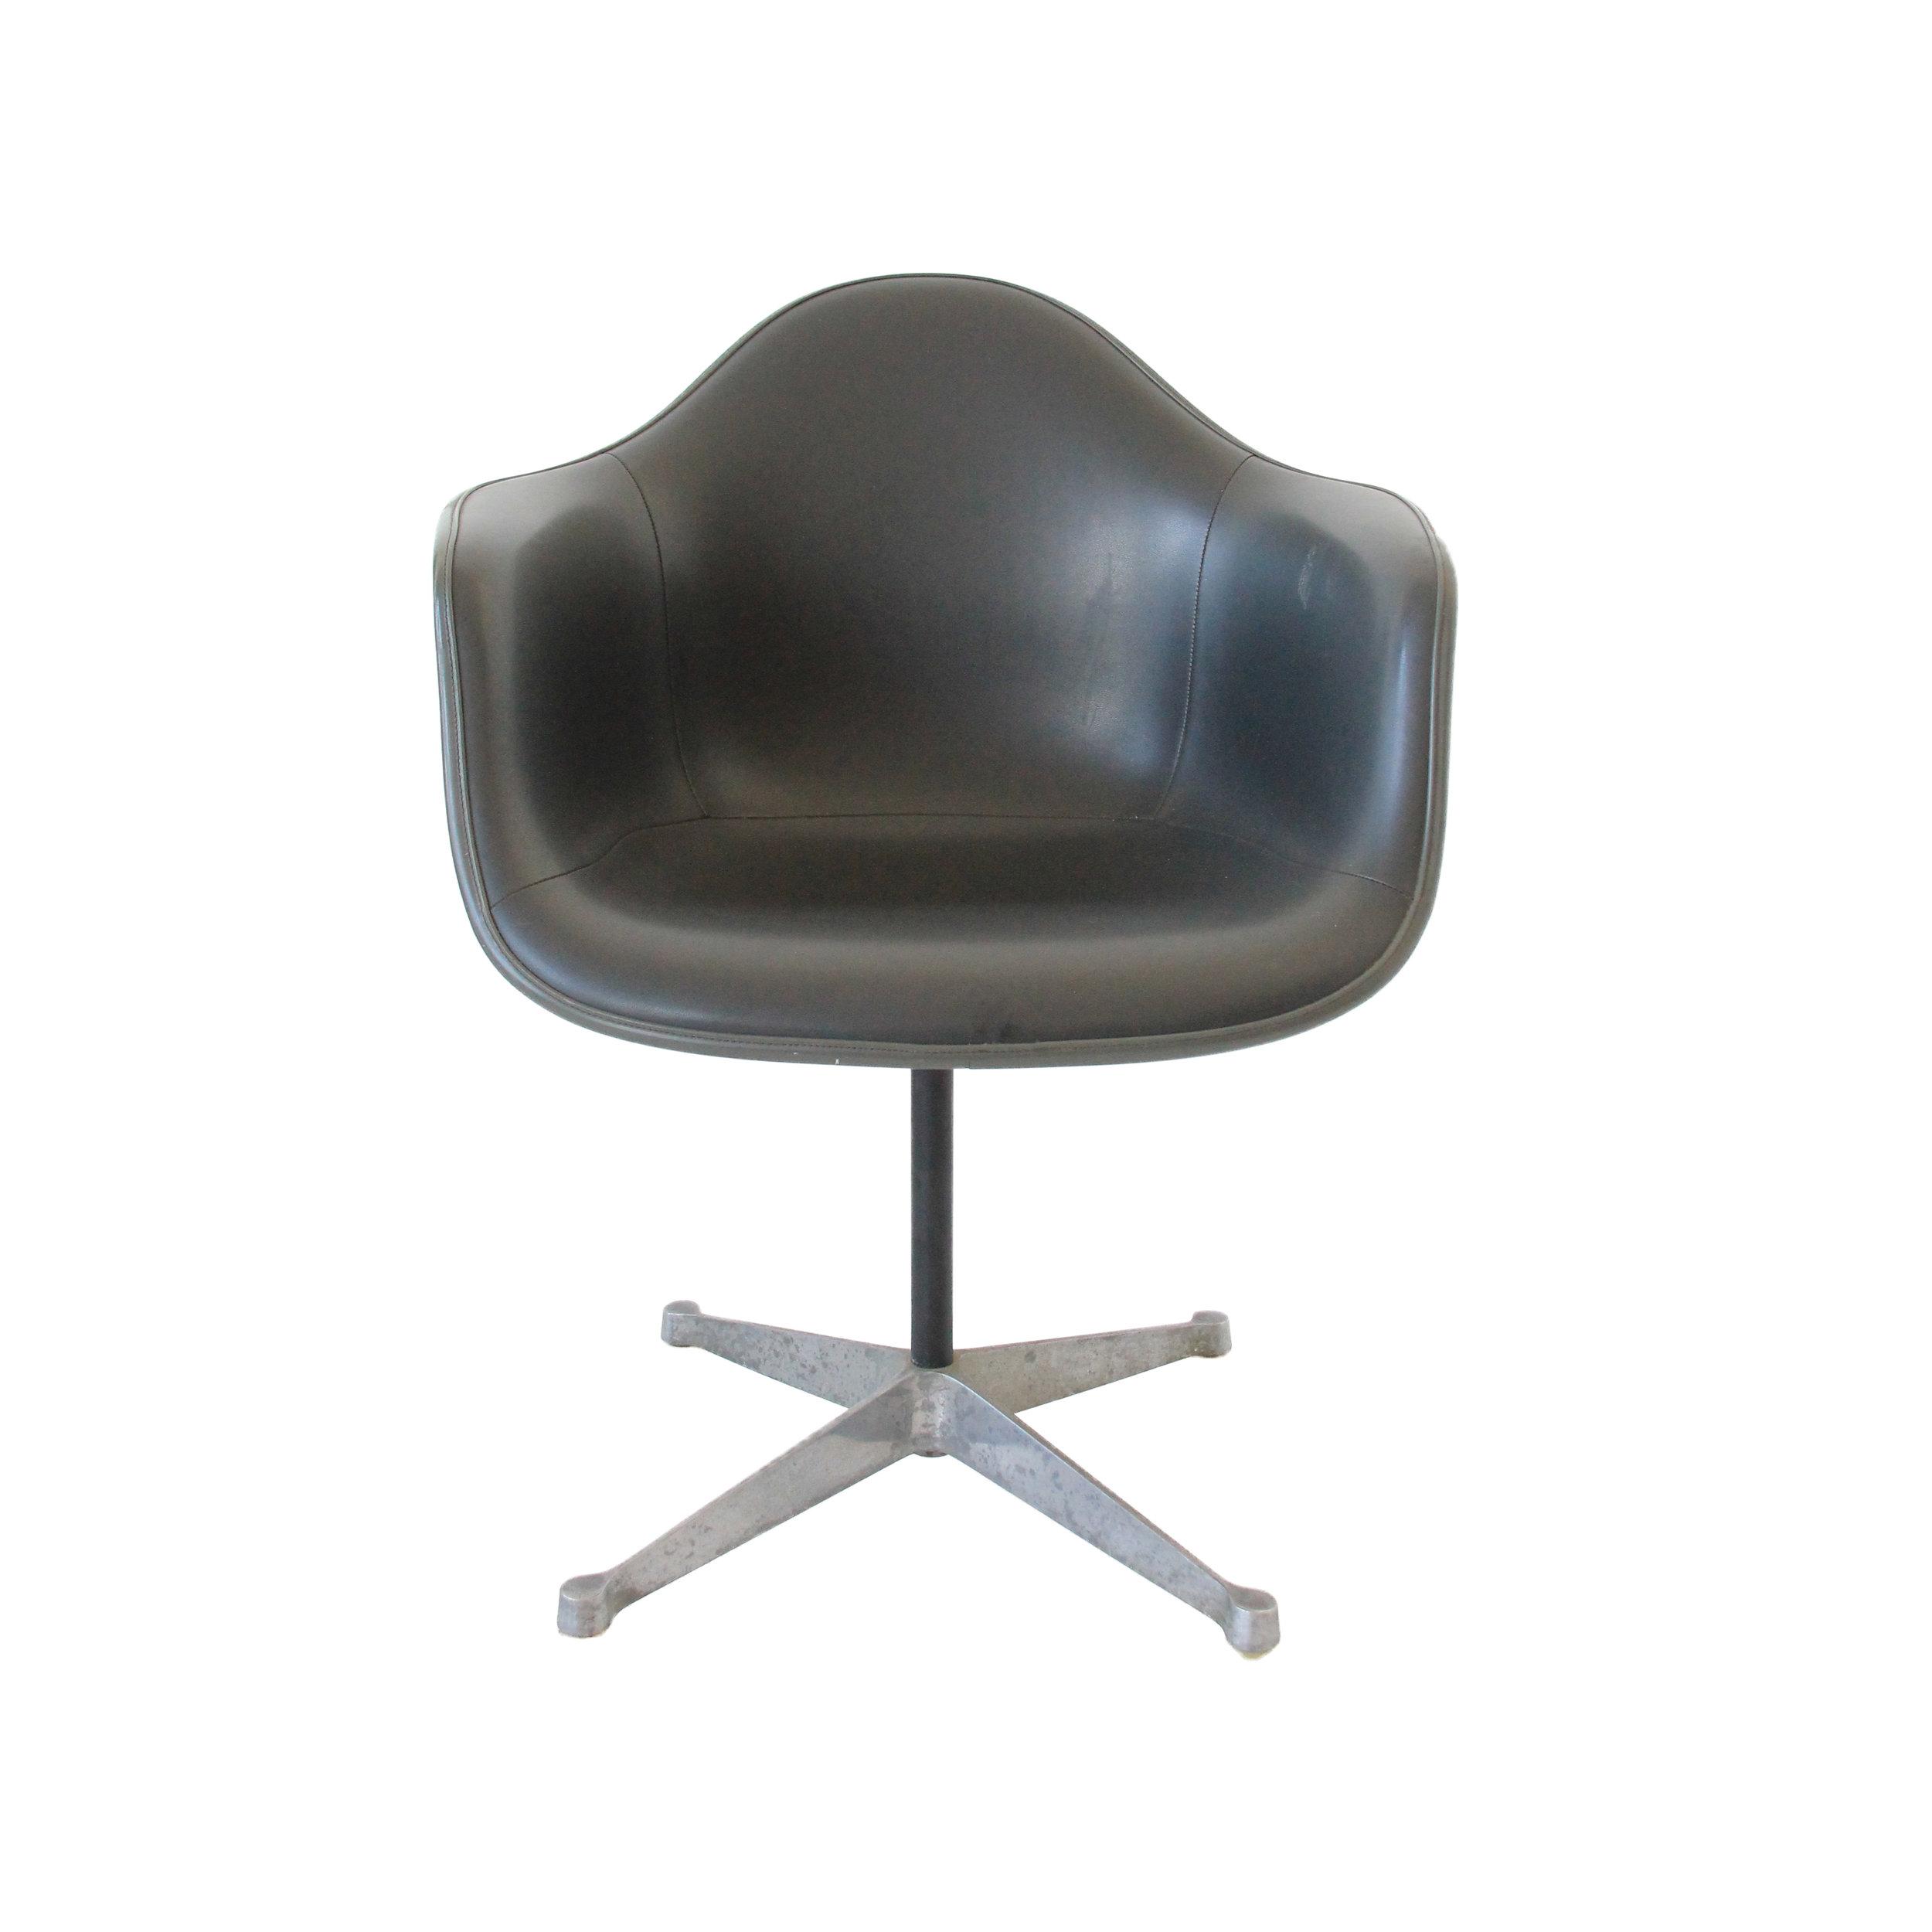 Vintage Mid Century Modern Herman Miller Swivel Chair